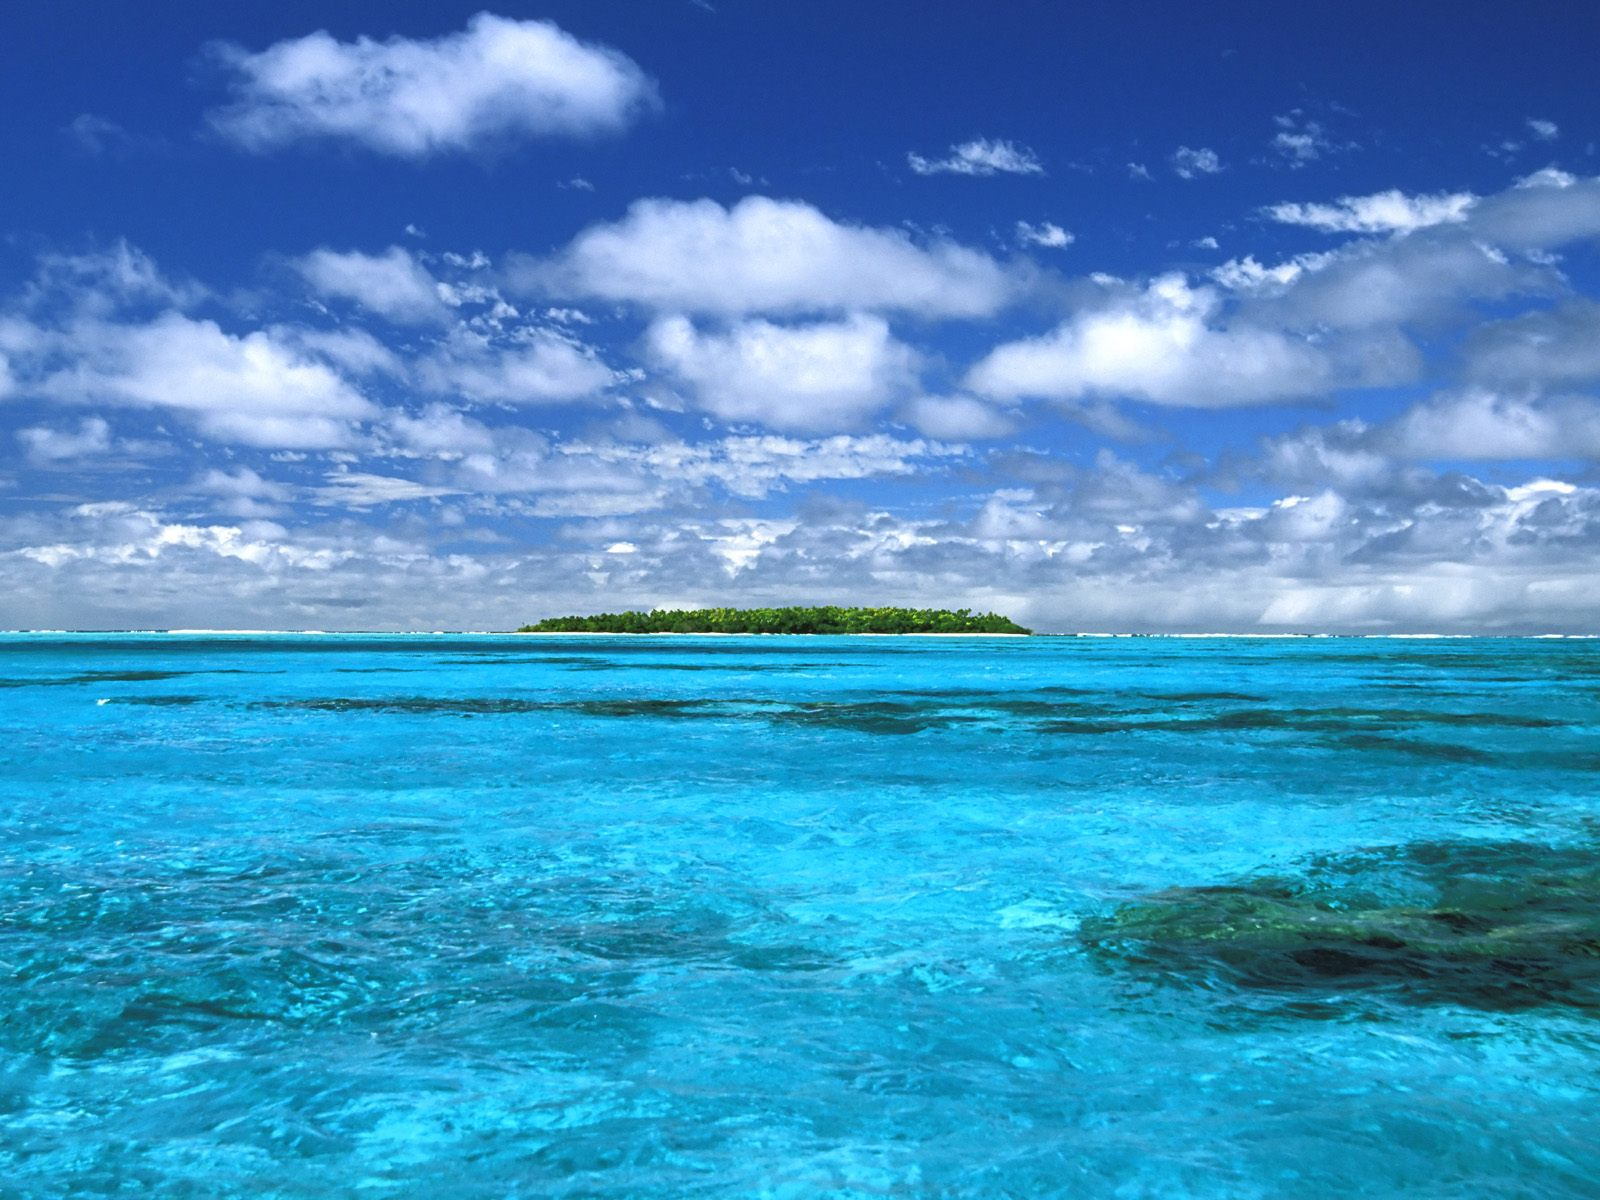 Distant_Island_Getaway.jpg